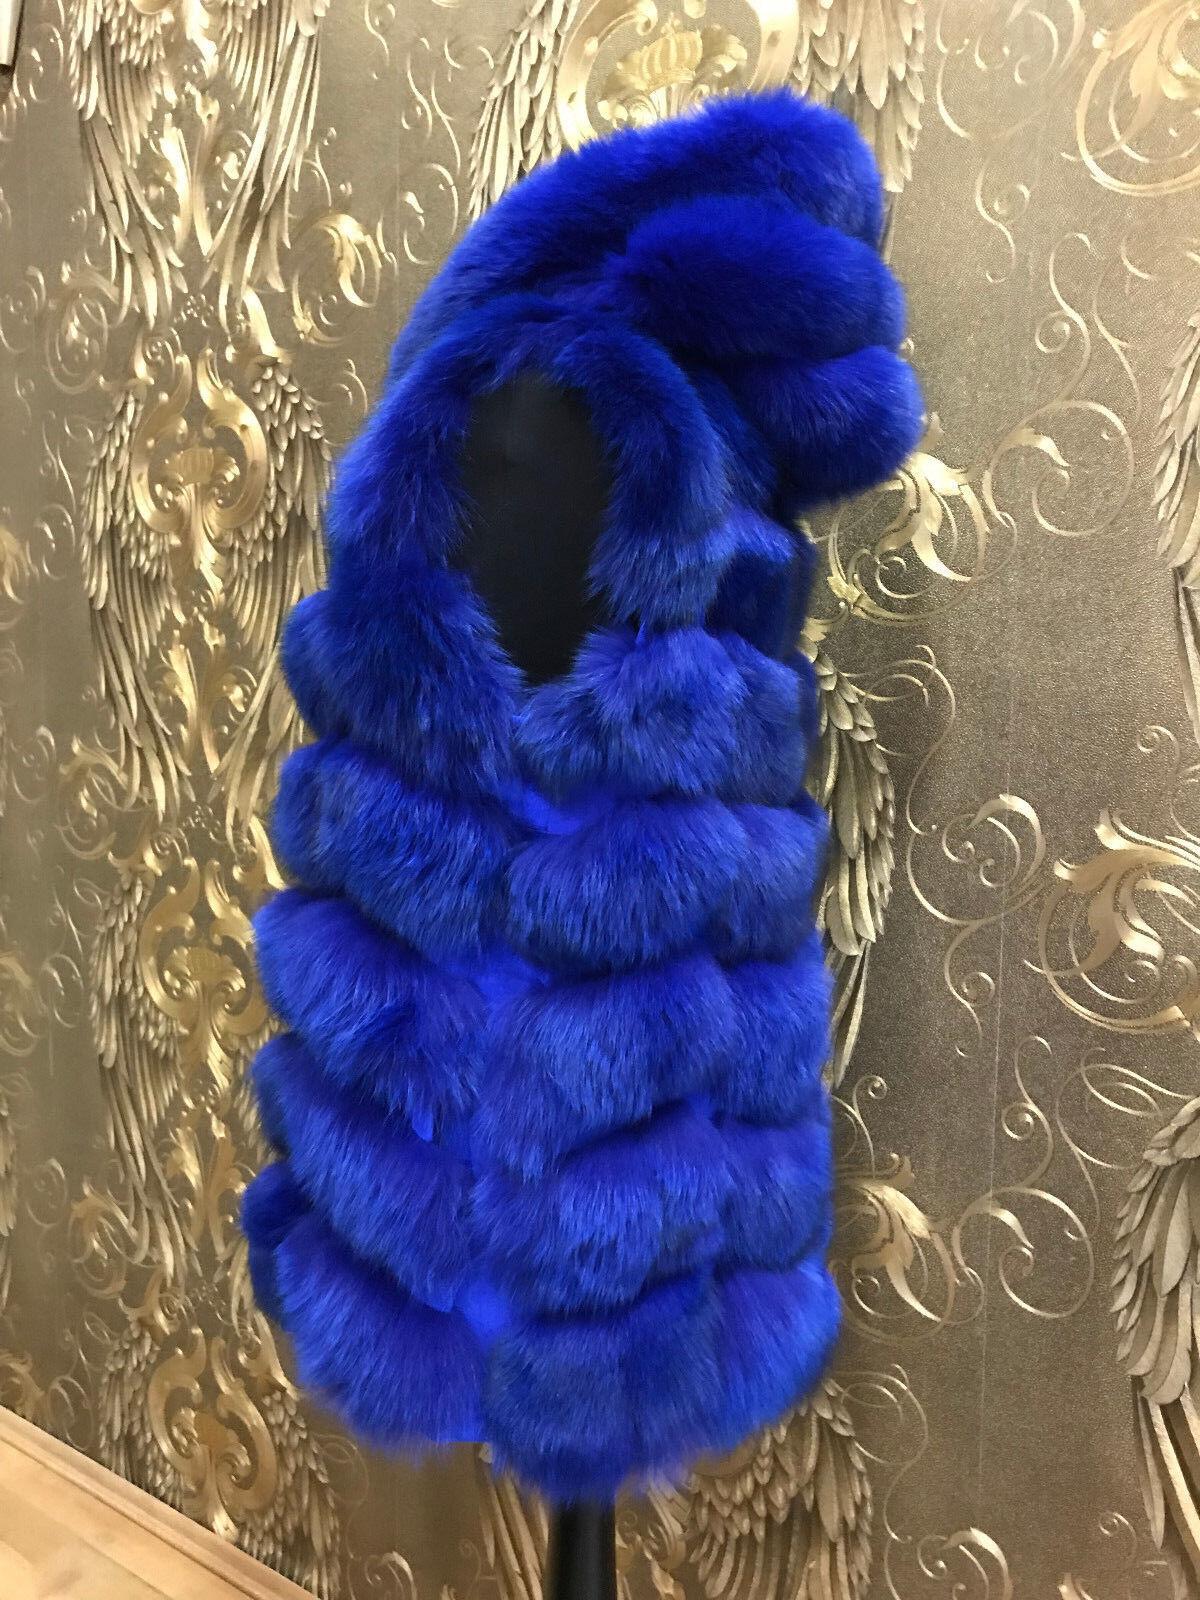 FUCHSWESTE PELZ WESTE blue FOX FUR VEST blueE FUCHS FUCHS FUCHS WESTE FELL WESTE MIT KAPUZE 6c6919